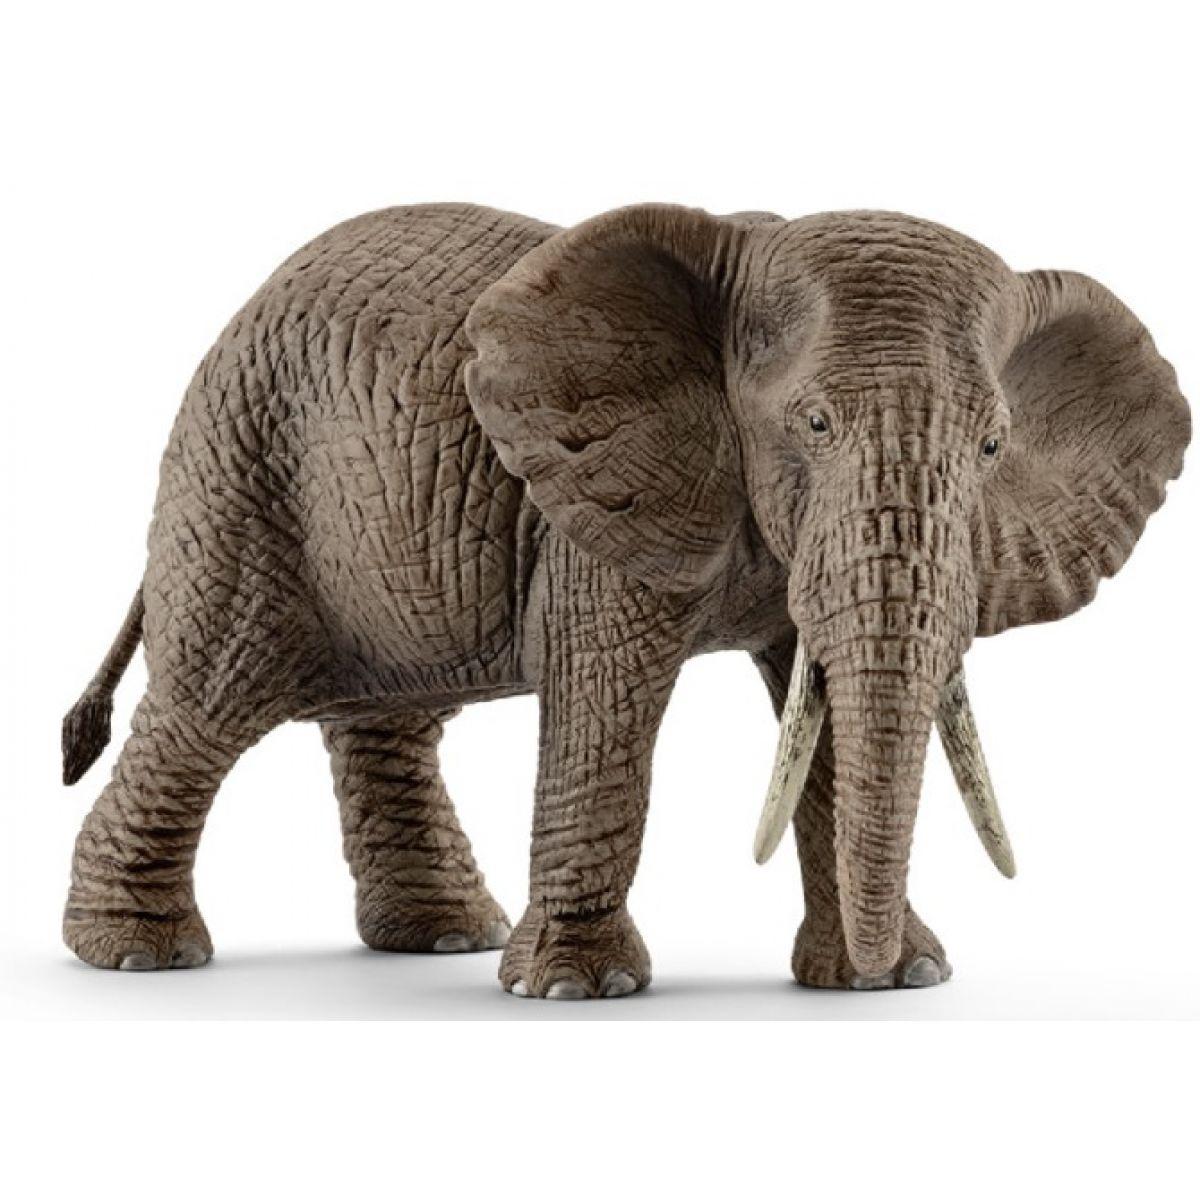 Schleich Slon africký samice